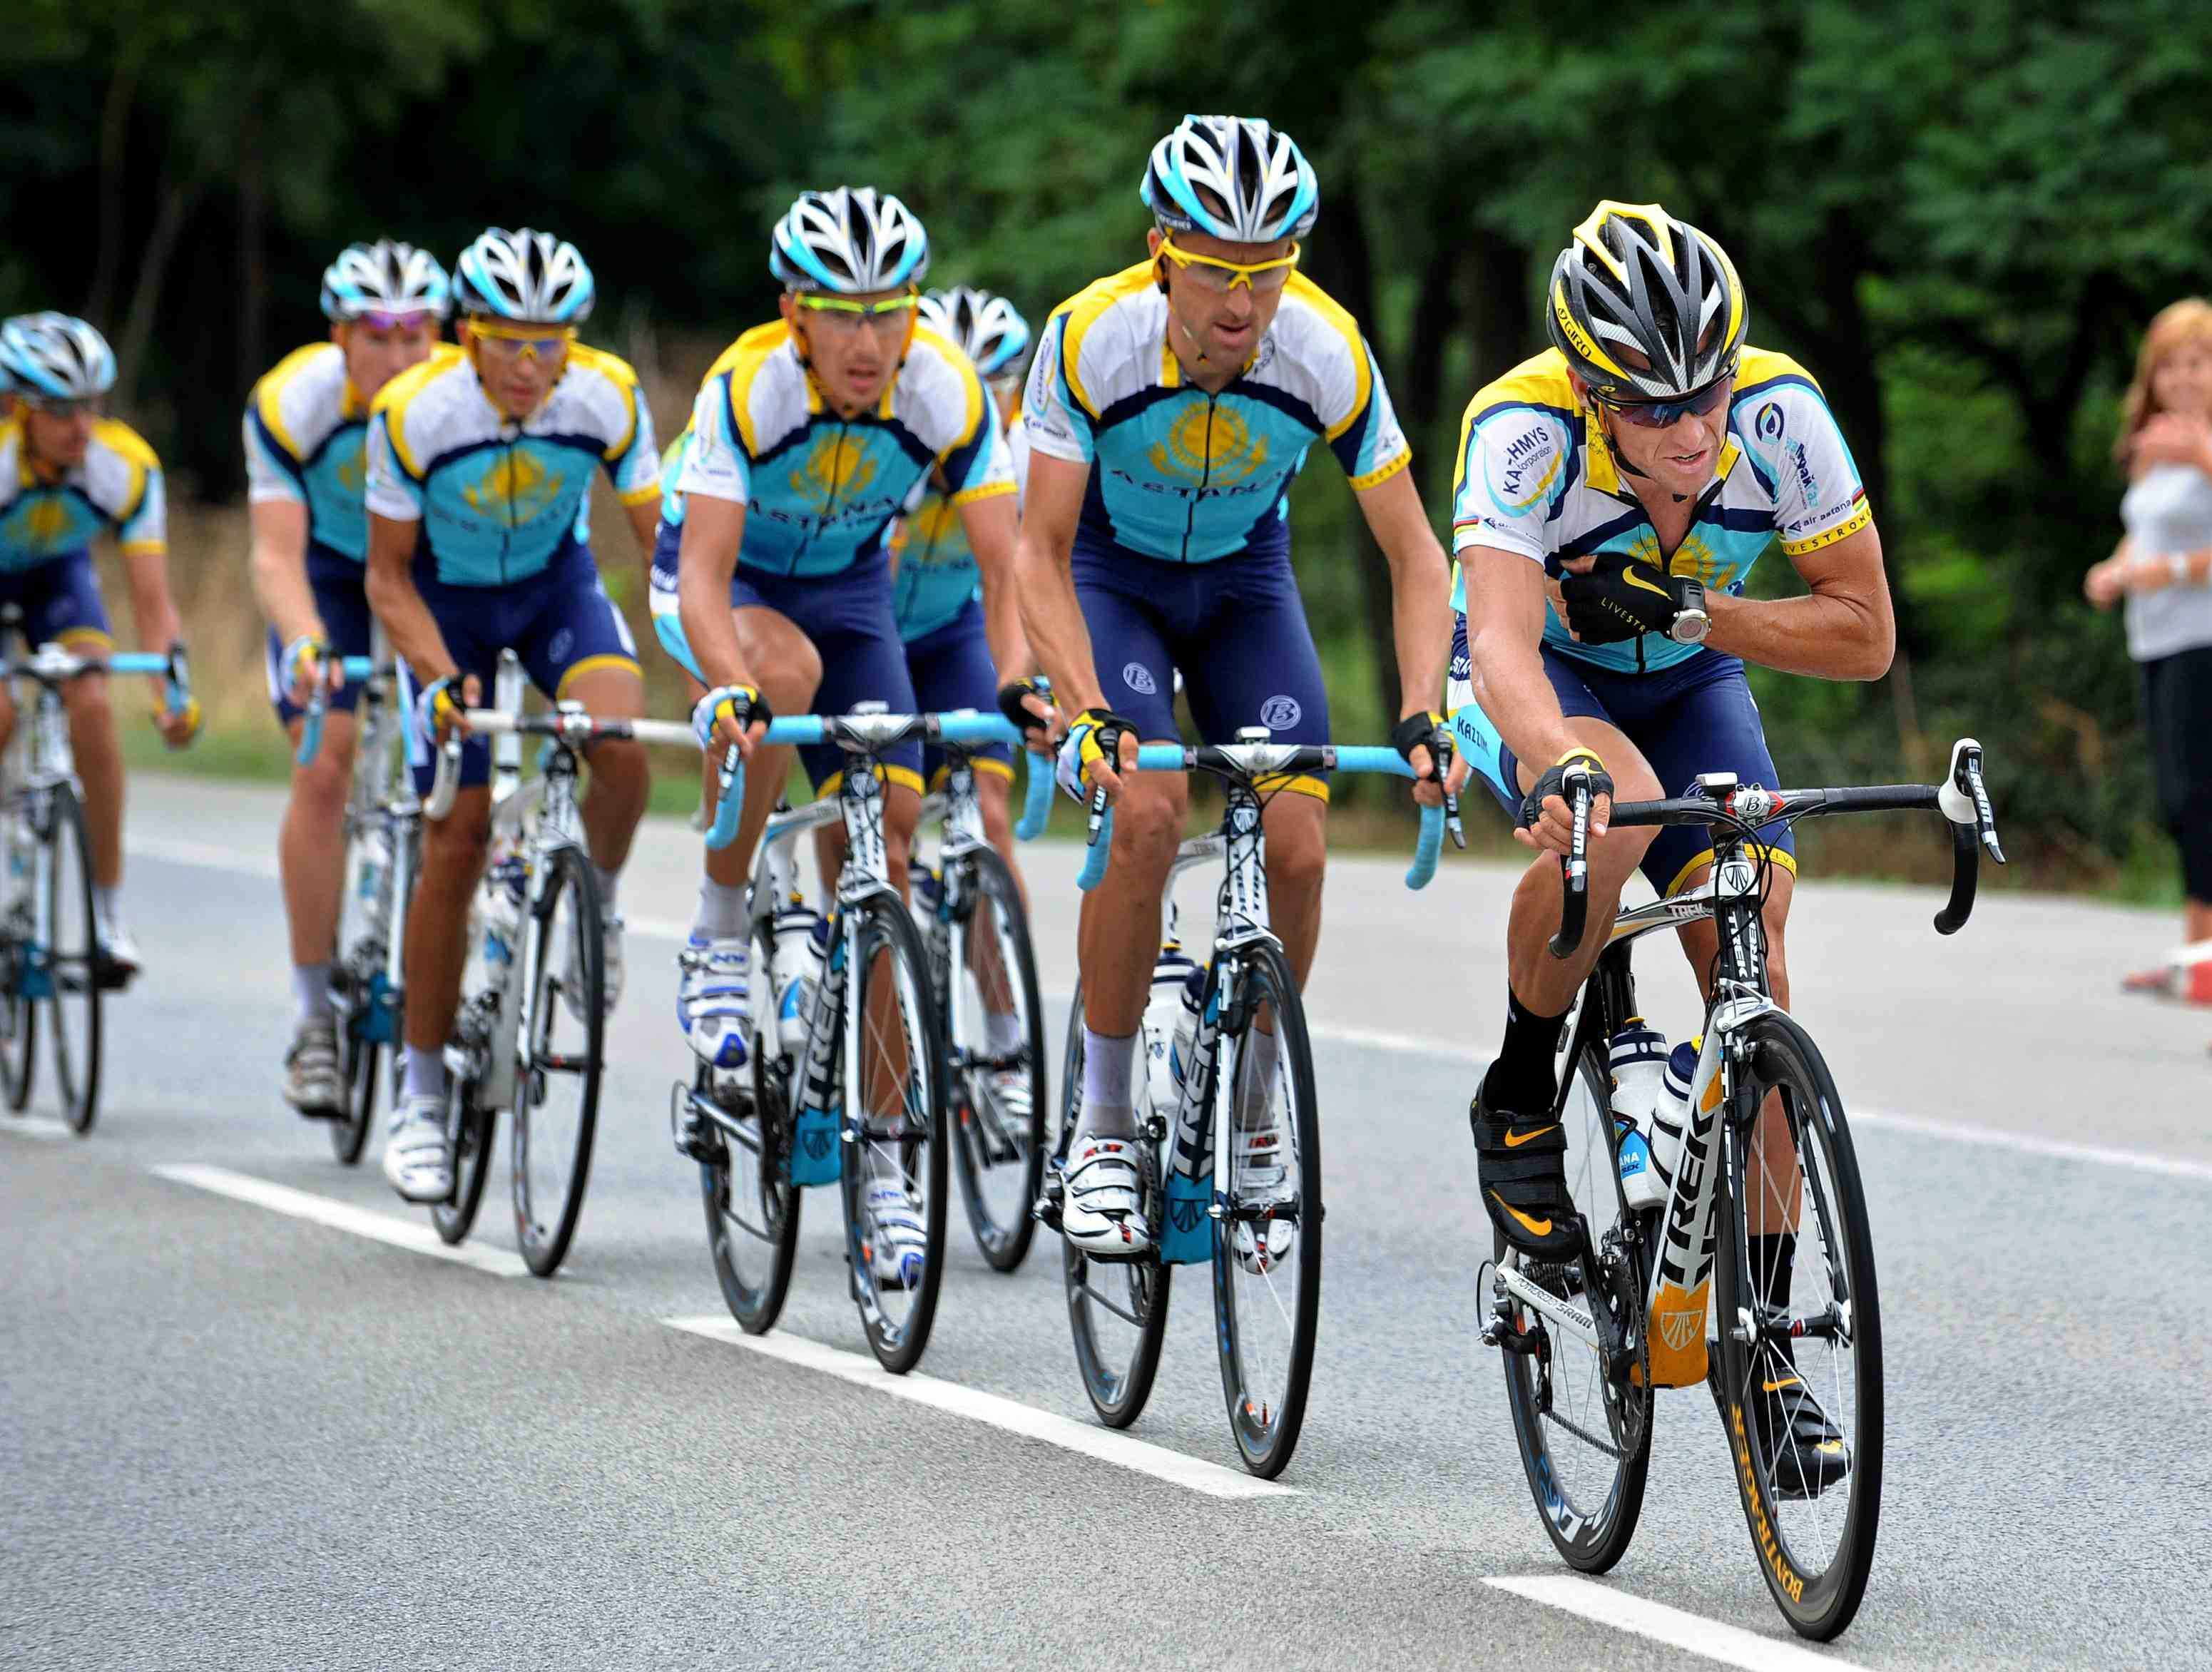 Lance Armstrong's Astana team believes in using race radios, like those pioneered by his 1990s Motorola team.